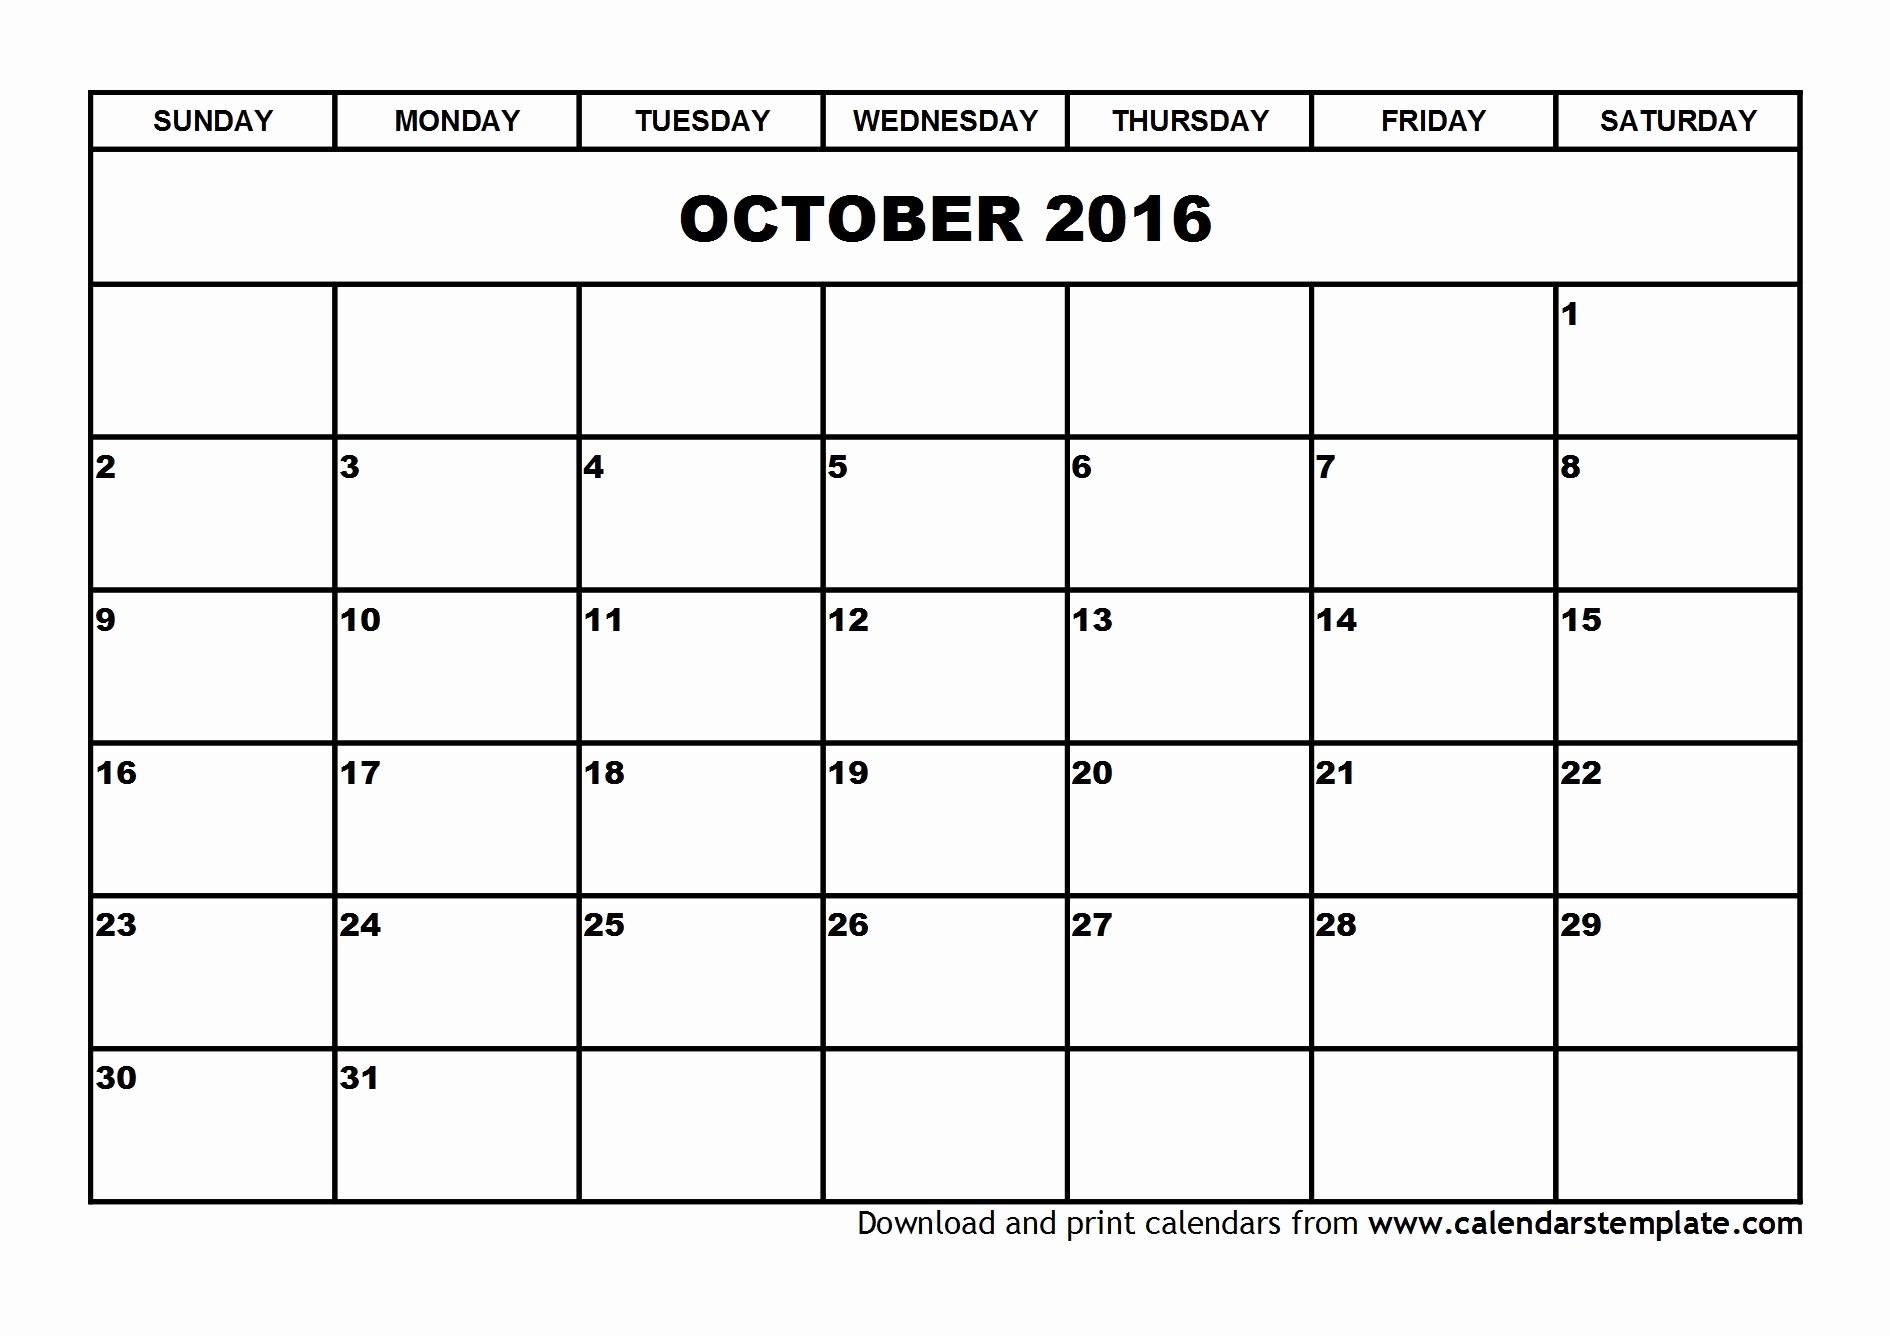 Free Printable Calendar 2016 Templates Lovely October 2016 Calendar Template